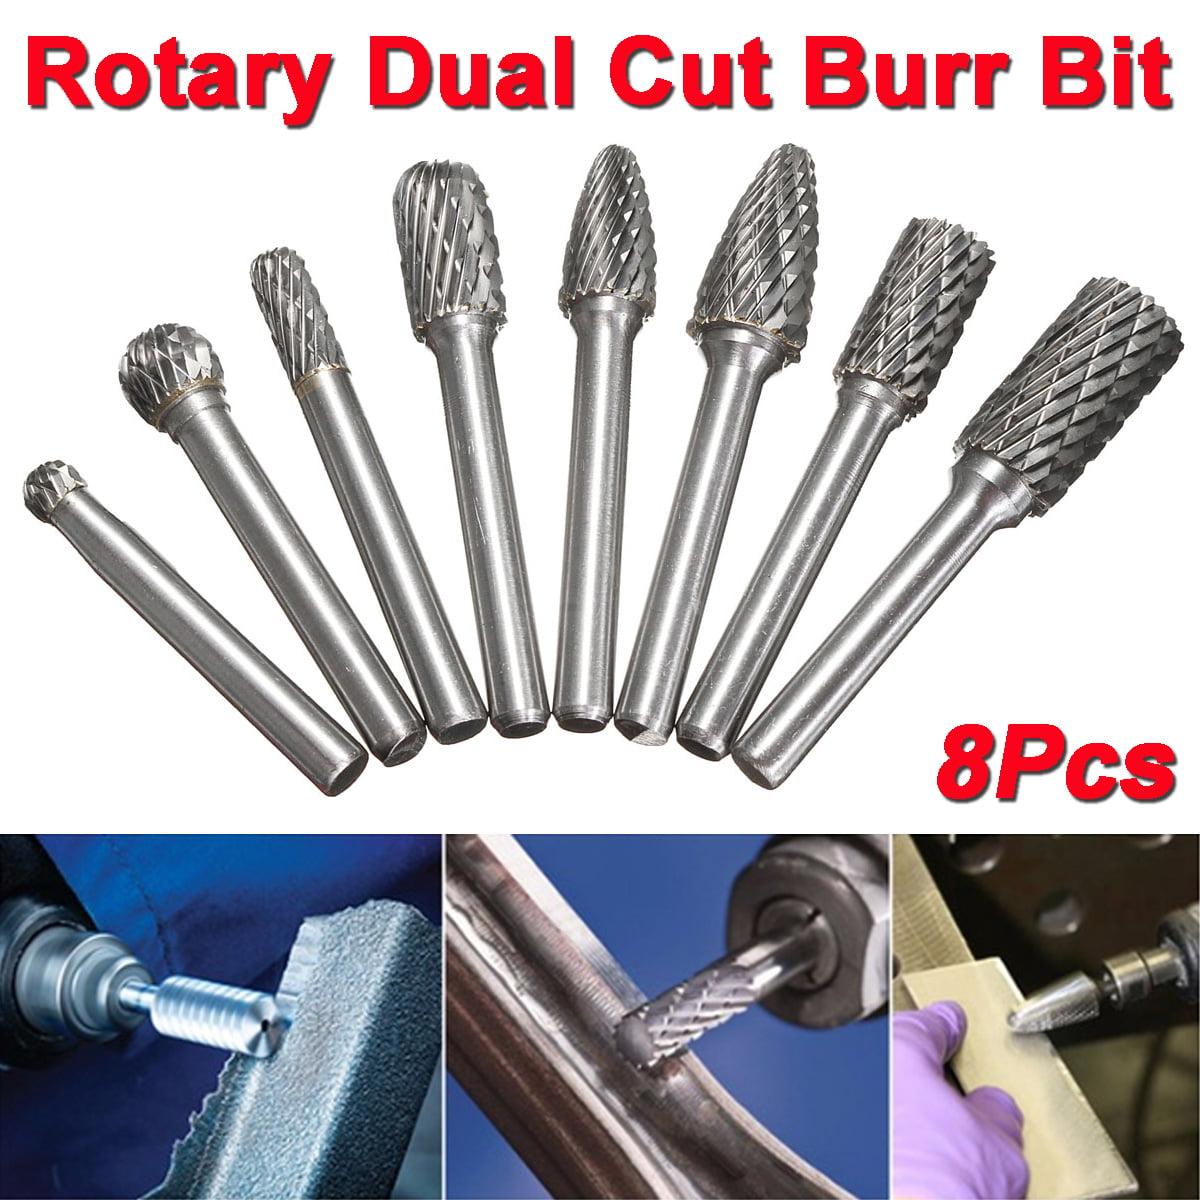 8Pcs 1//4'' Double Cut Carbide Alloy Rotary Burr Shank File Power Tools Set Hot